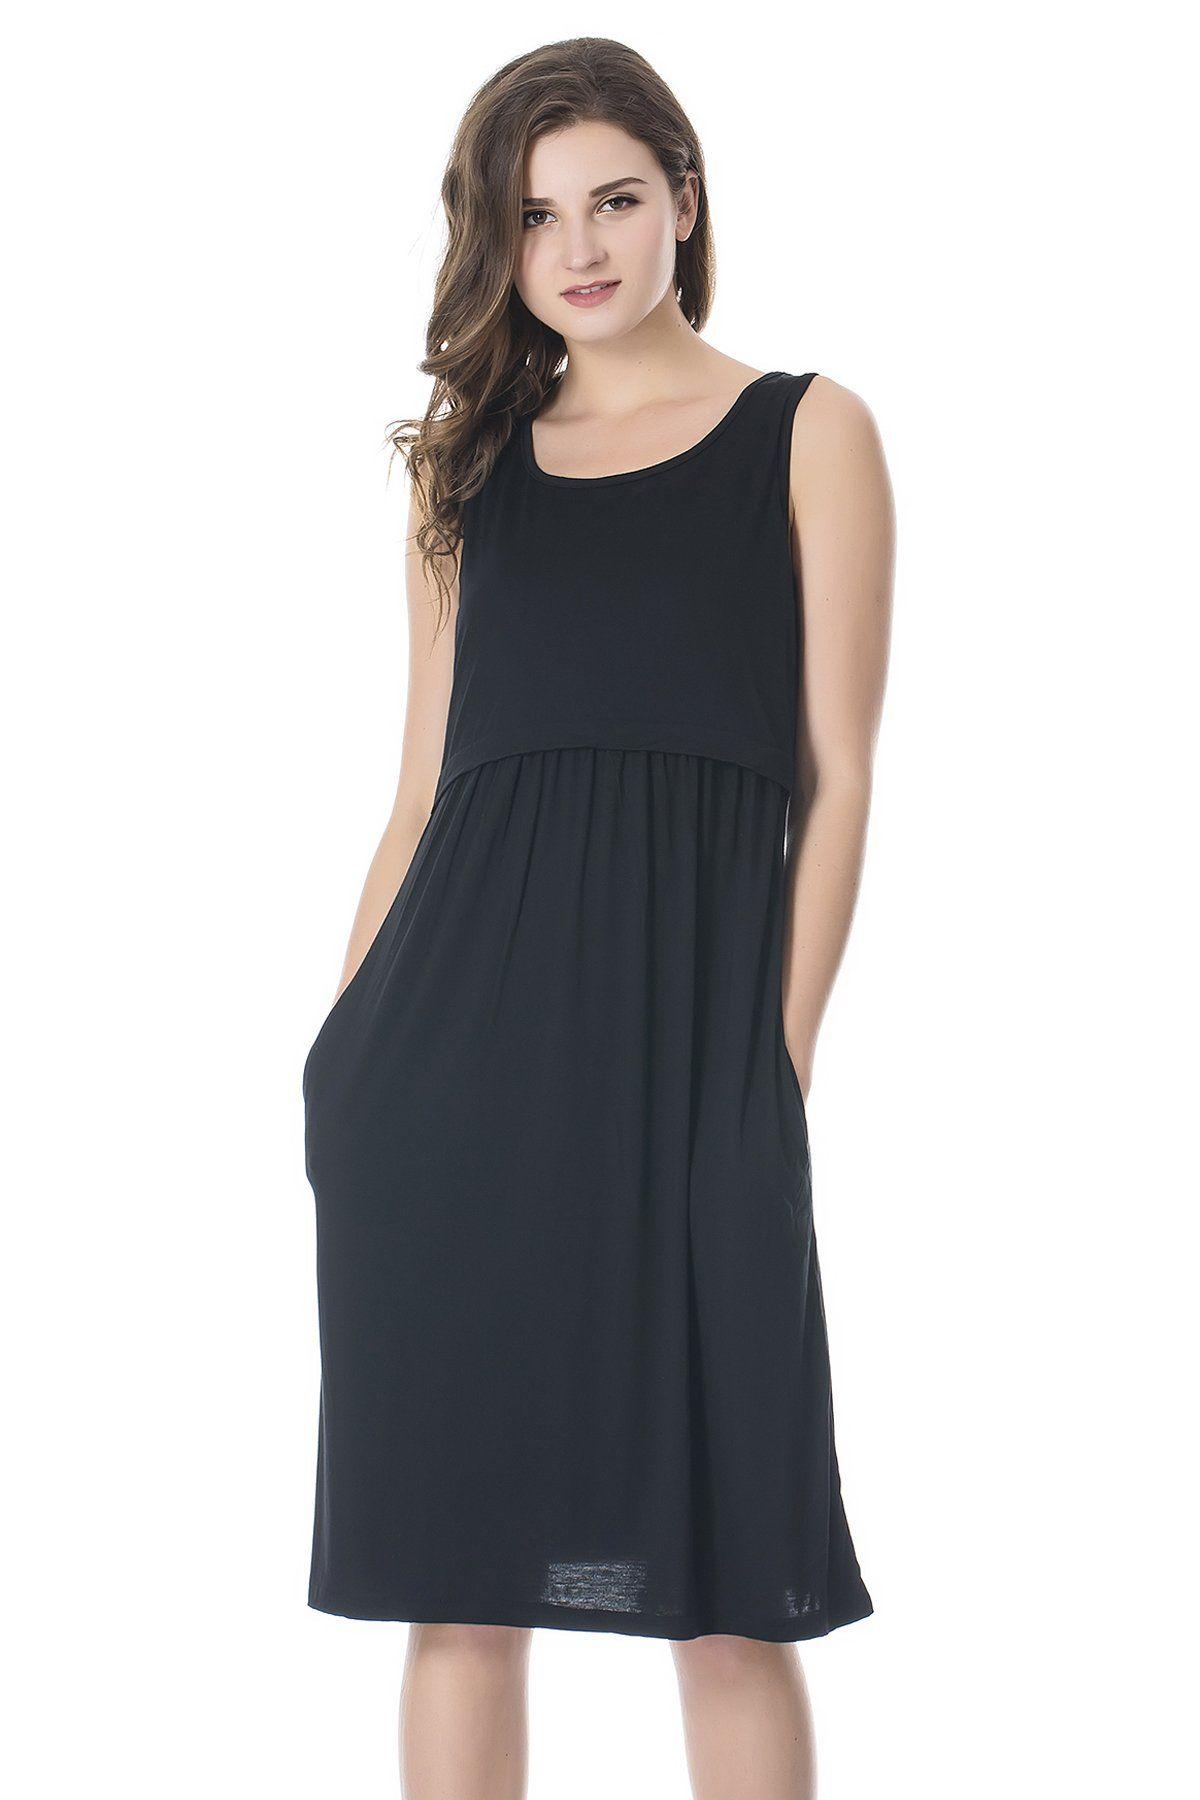 f7a6294c47d Maternity Outfits - skinny maternity maxi dress : Bearsland Womens  Sleeveless Maternity Dress Empire Waist Nursing Breastfeeding Dress Summer  Black Medium ...